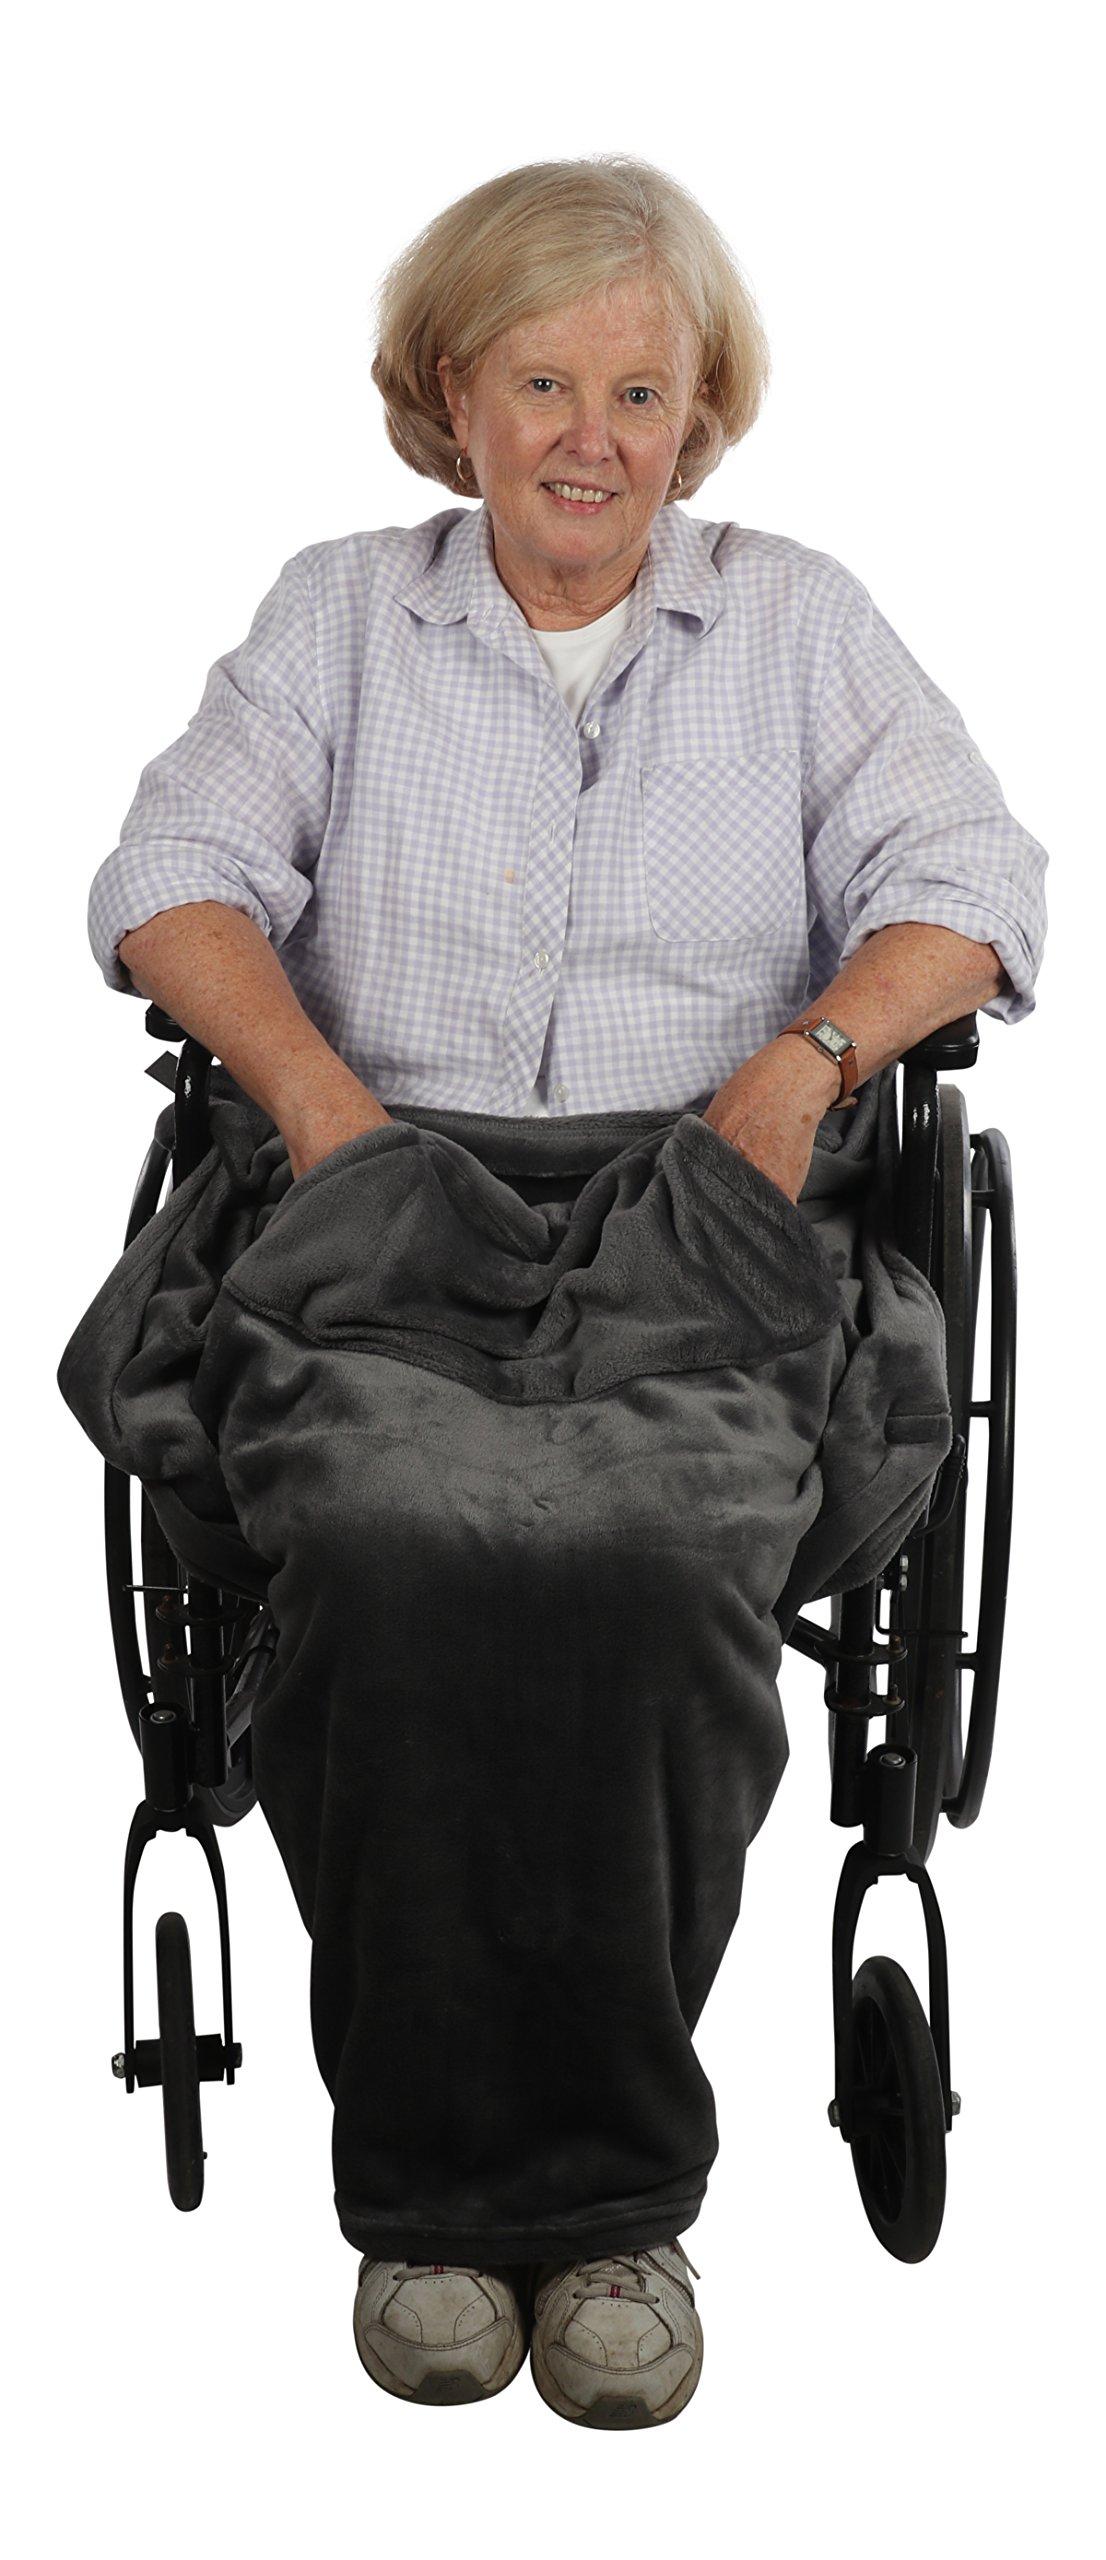 Lightweight Wheelchair Blanket, Warm Fleece, Fleece with Pockets (Grey)